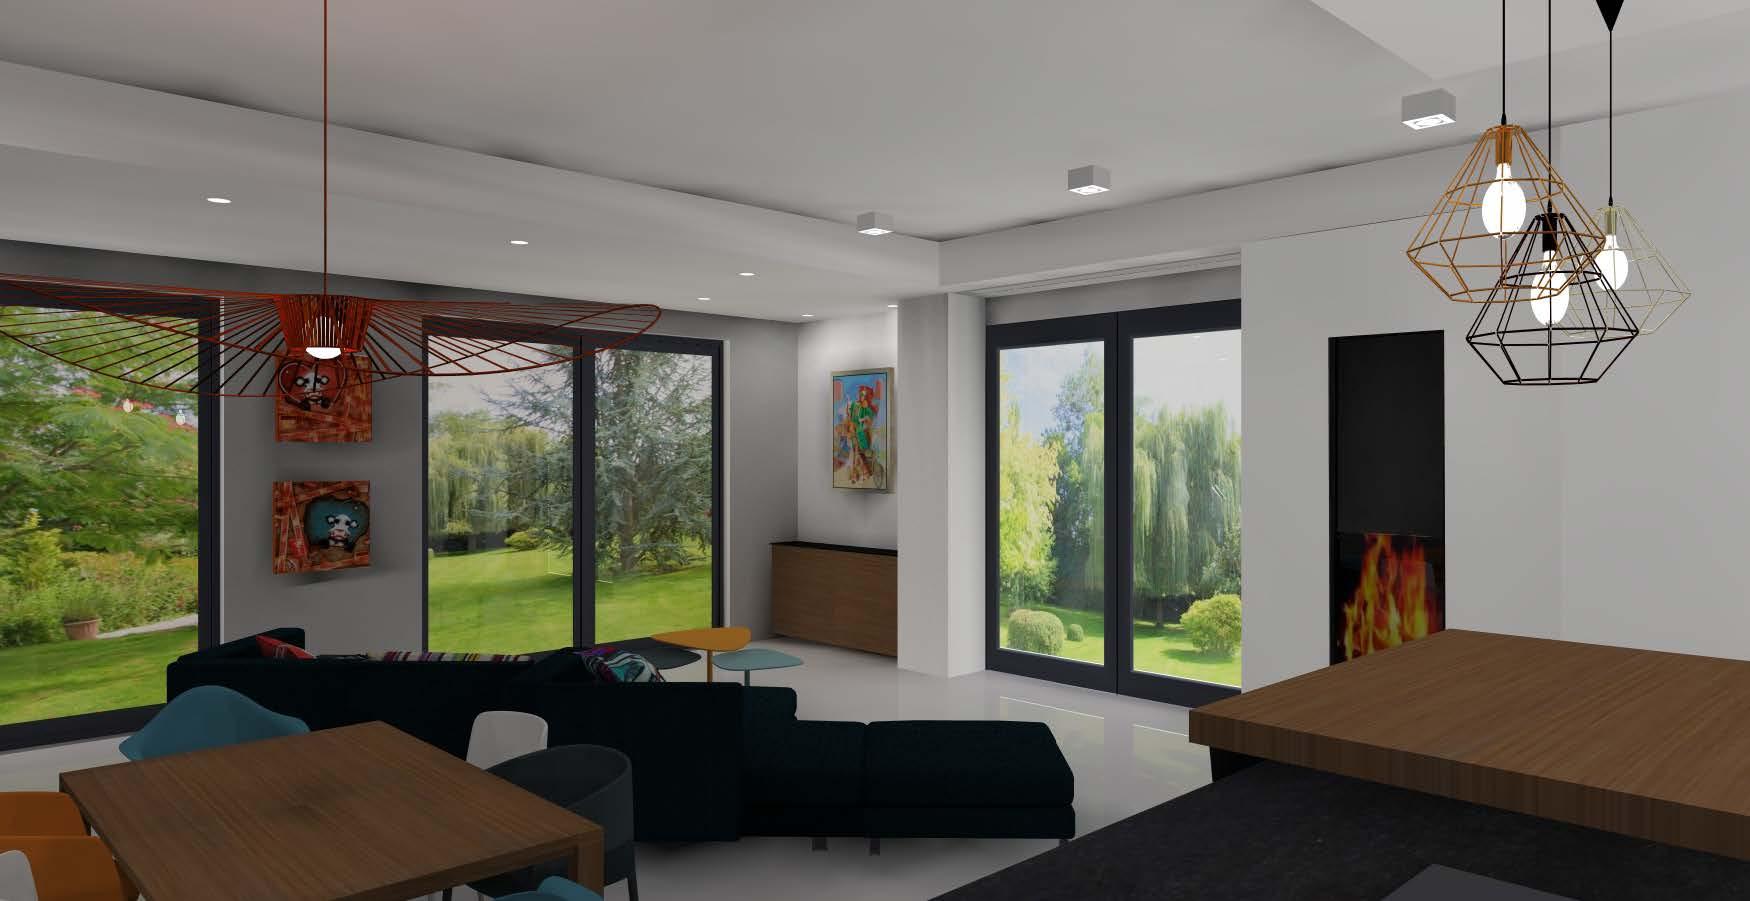 exemple de projet linecol interior. Black Bedroom Furniture Sets. Home Design Ideas